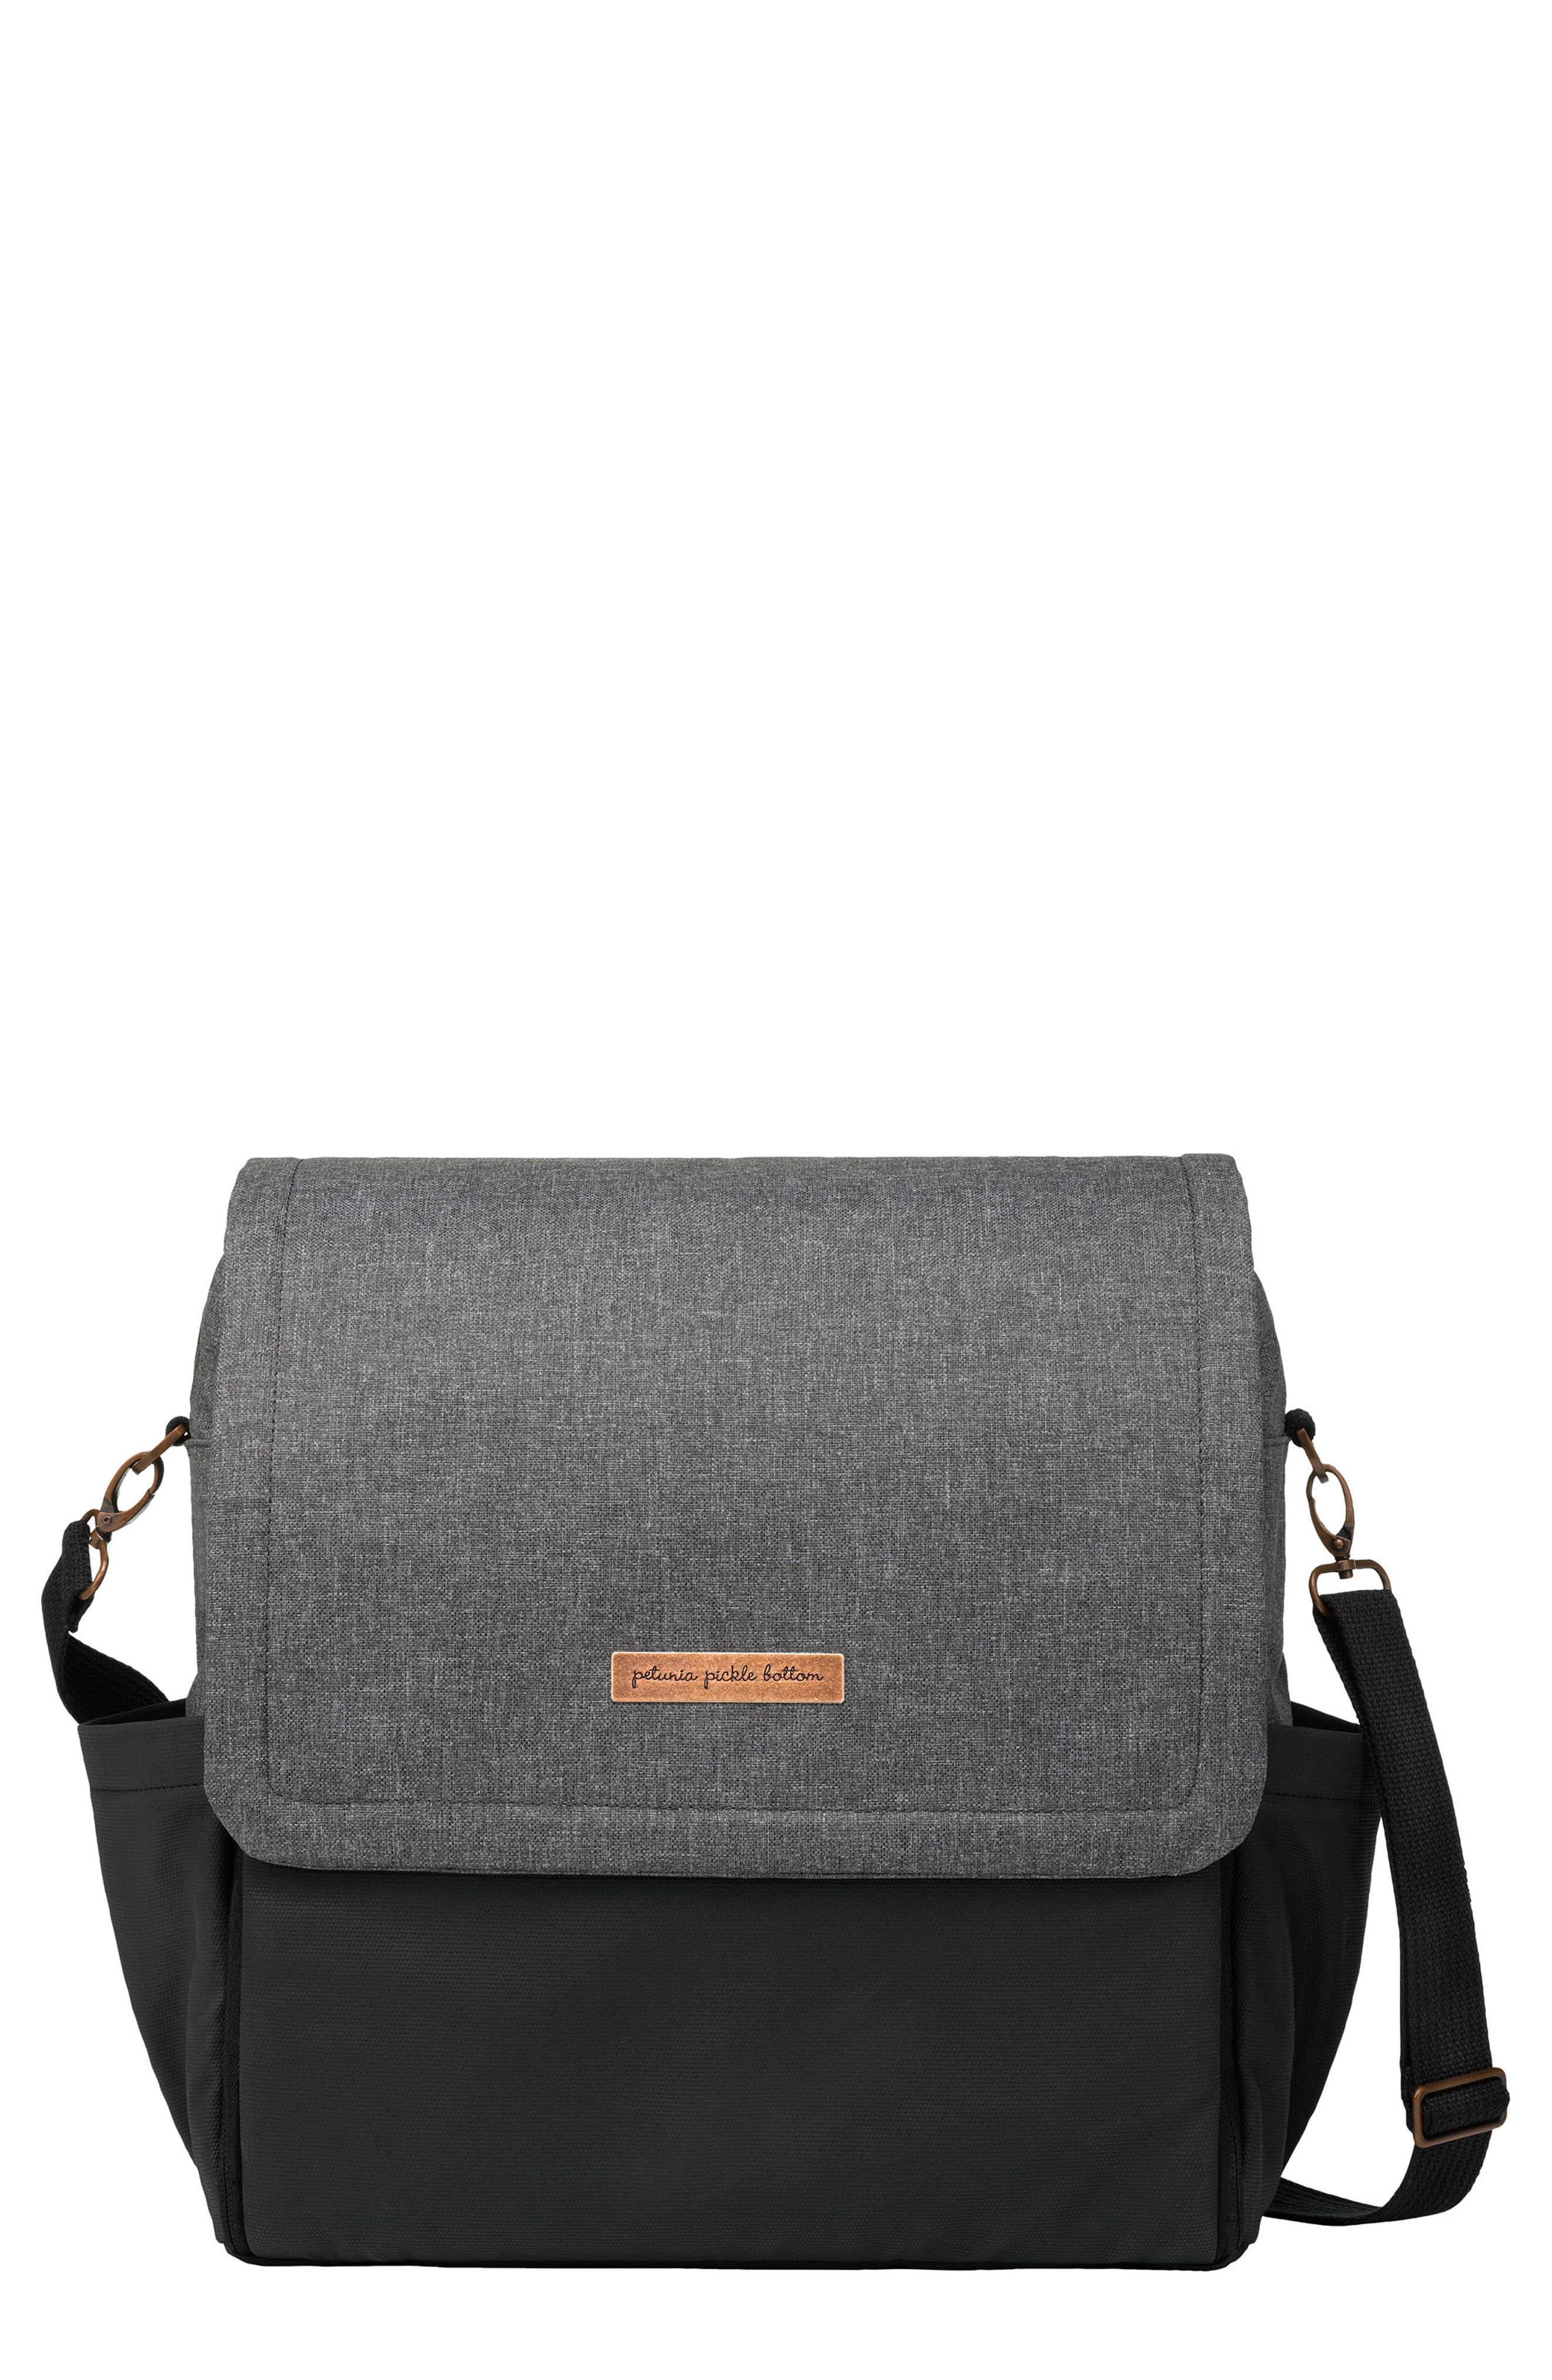 PETUNIA PICKLE BOTTOM Boxy Backpack Diaper Bag, Main, color, GRAPHITE/ BLACK